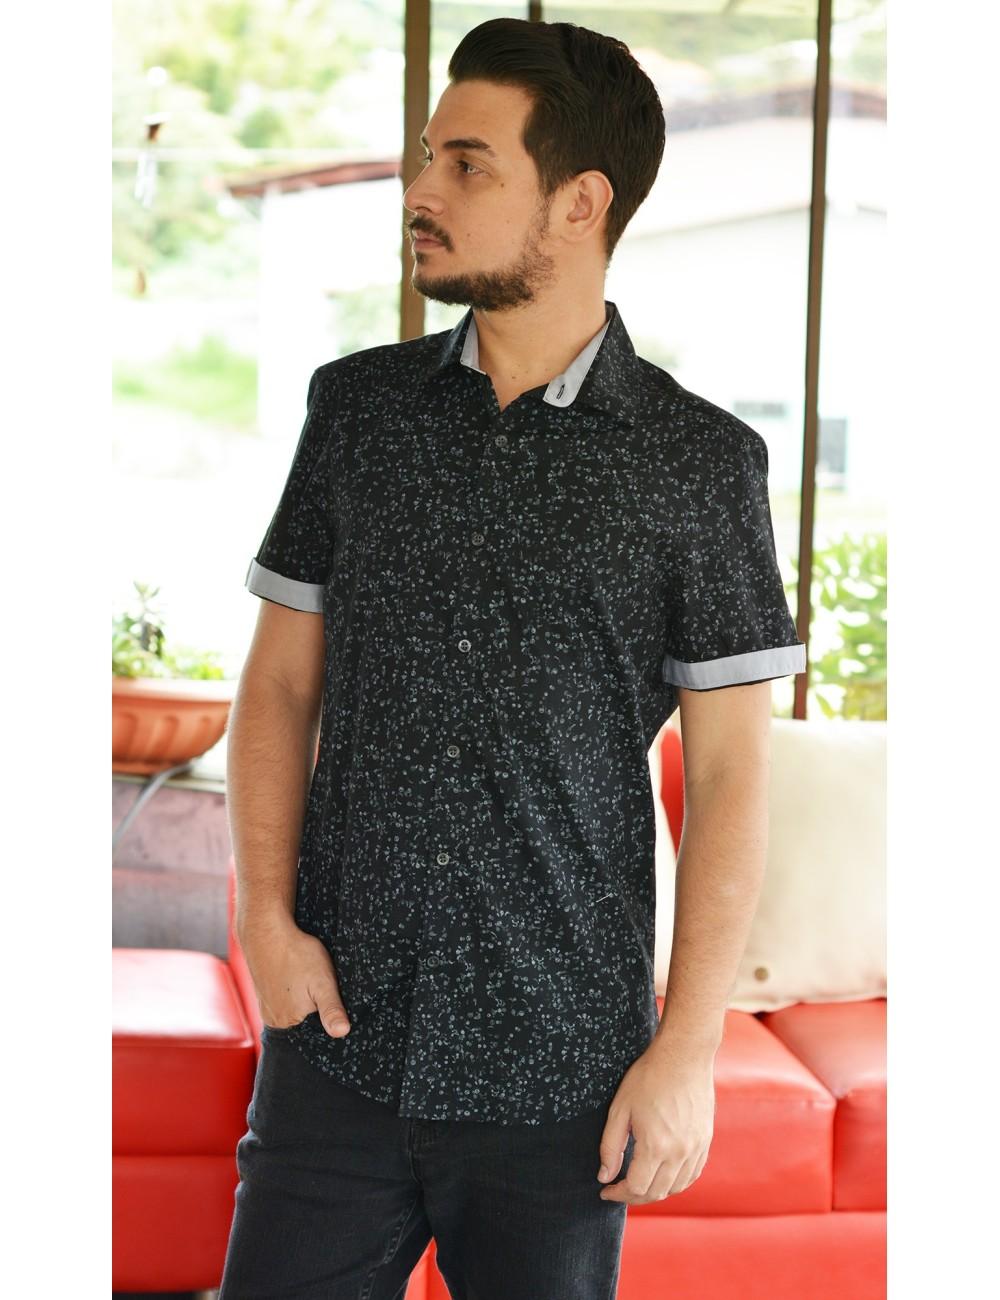 Camisa negra manga corta con estampado gris